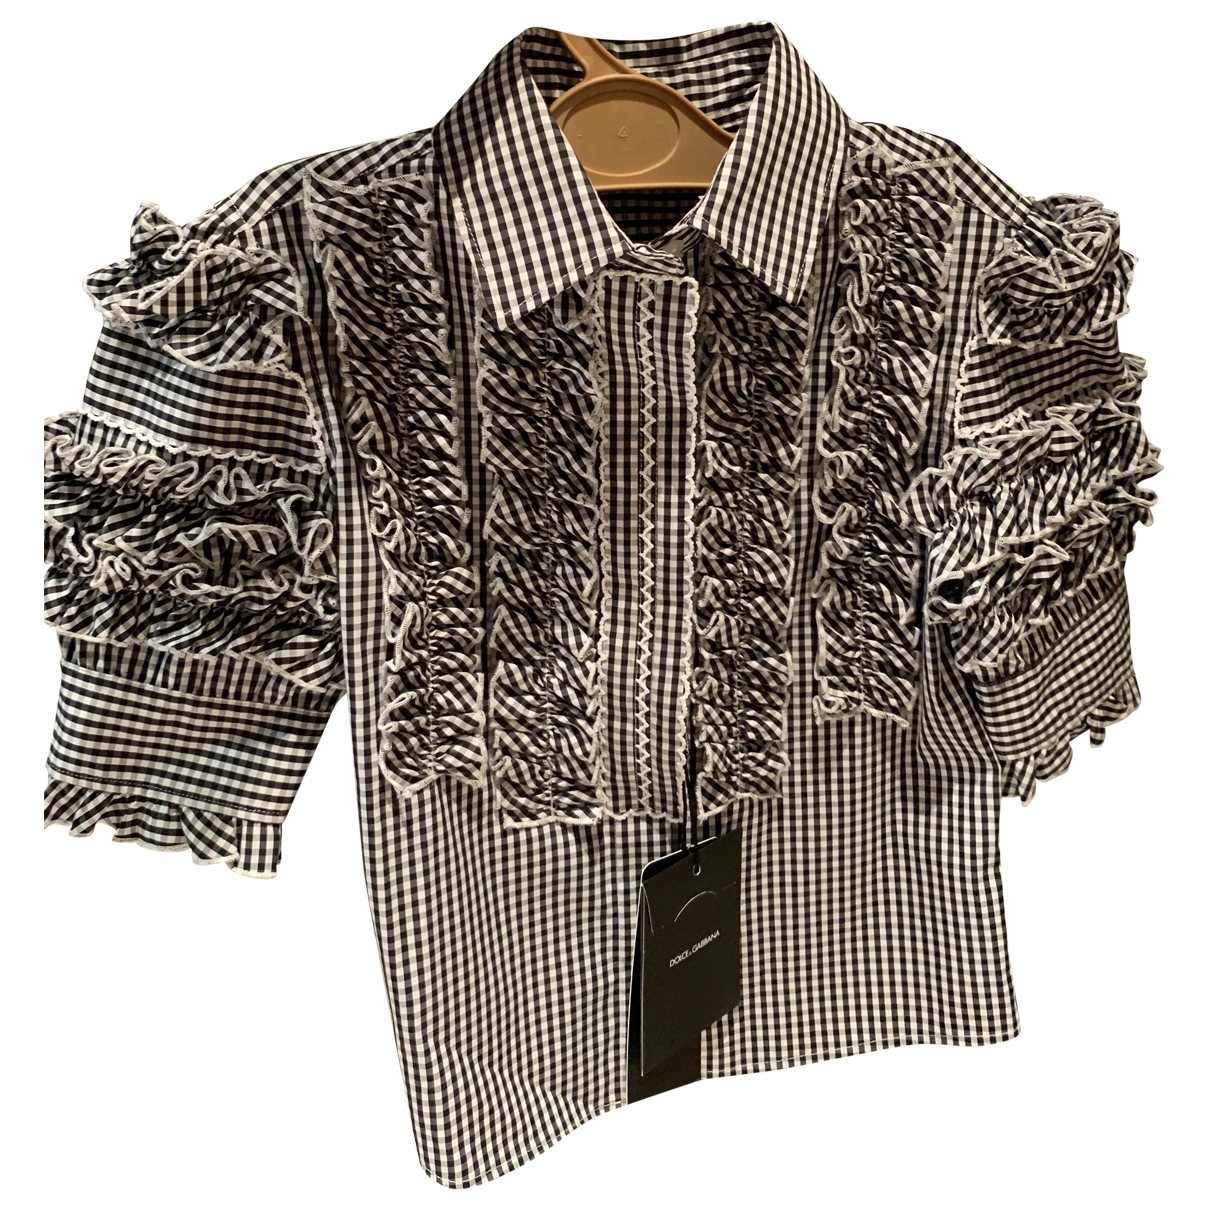 Dolce & Gabbana \N Oberteile in  Blau Baumwolle